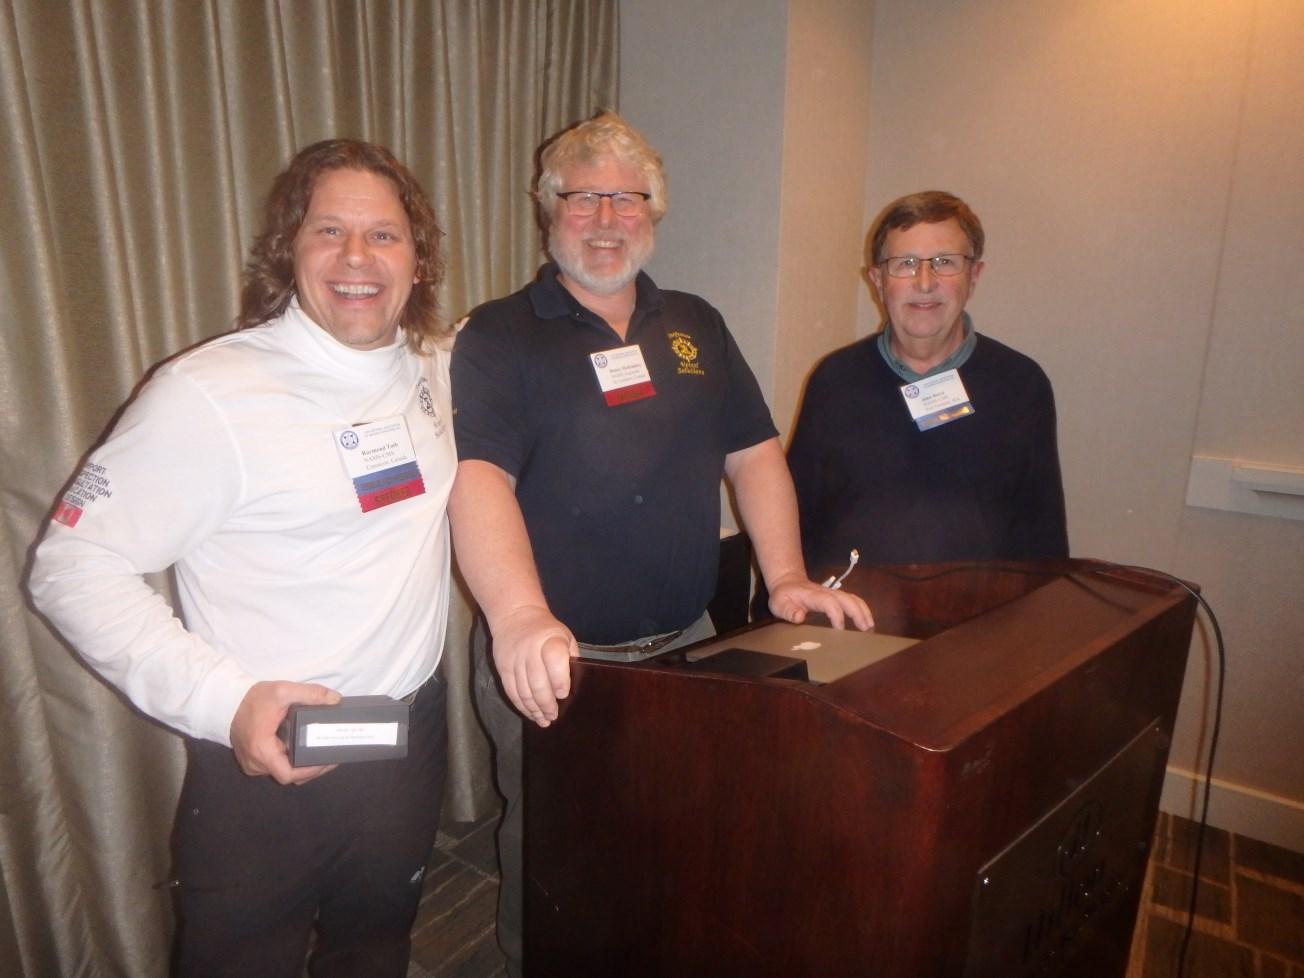 Speakers Ray Toth, Dan McKindsey & NAMS Regional VP John Baird